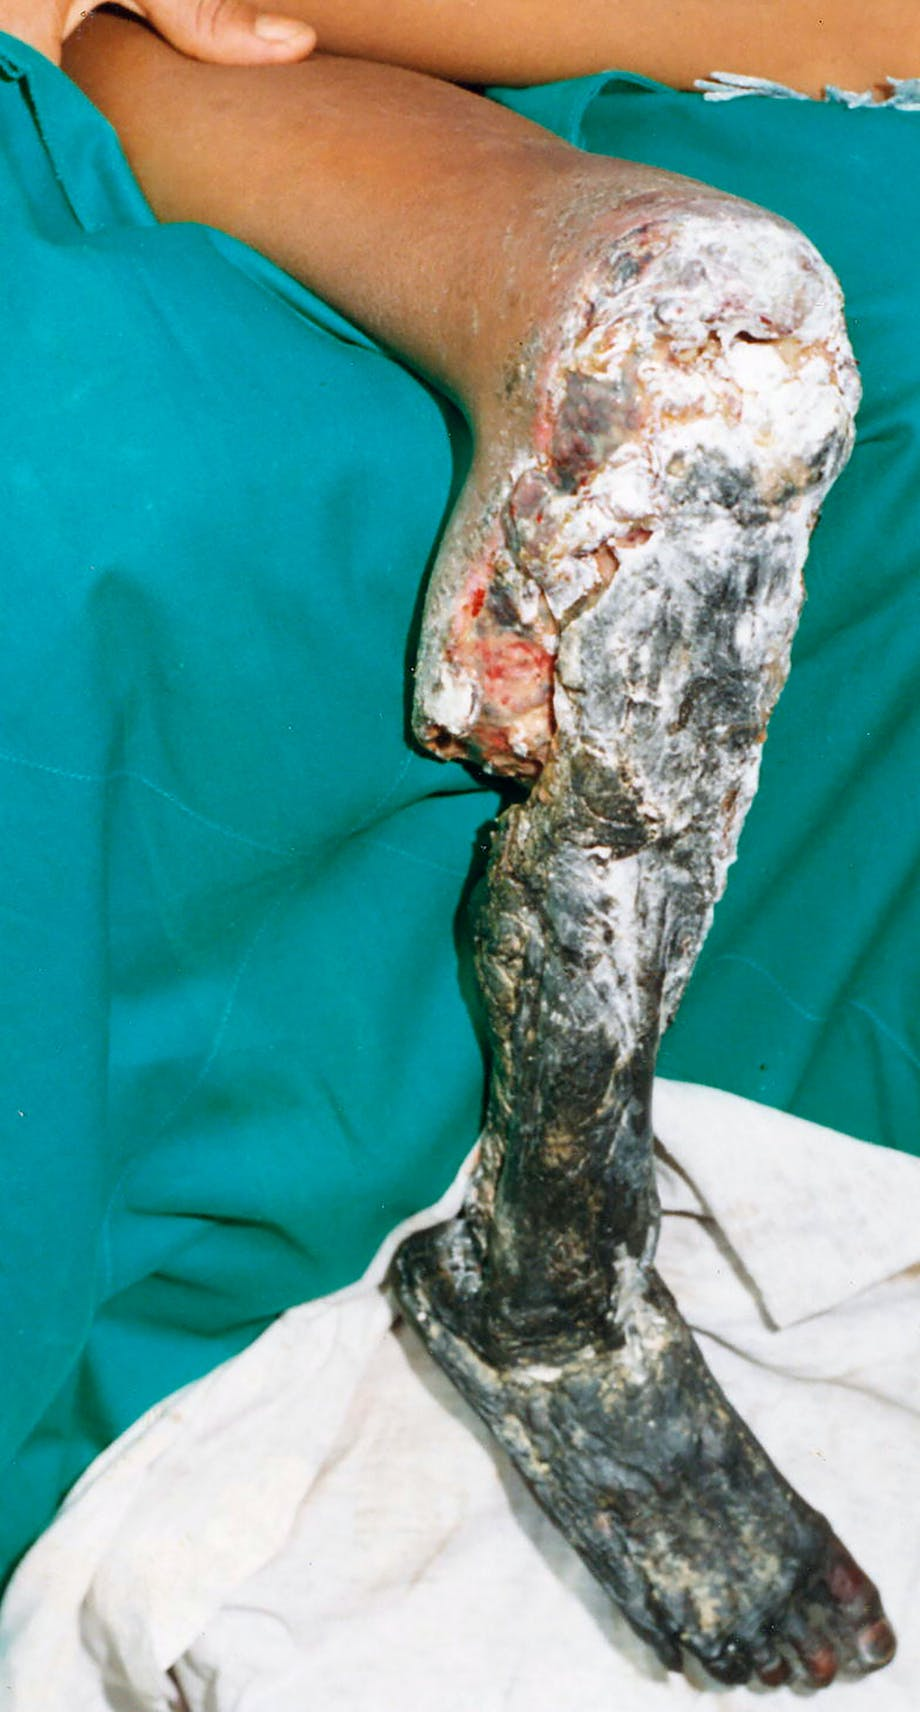 Vævsdød på bein